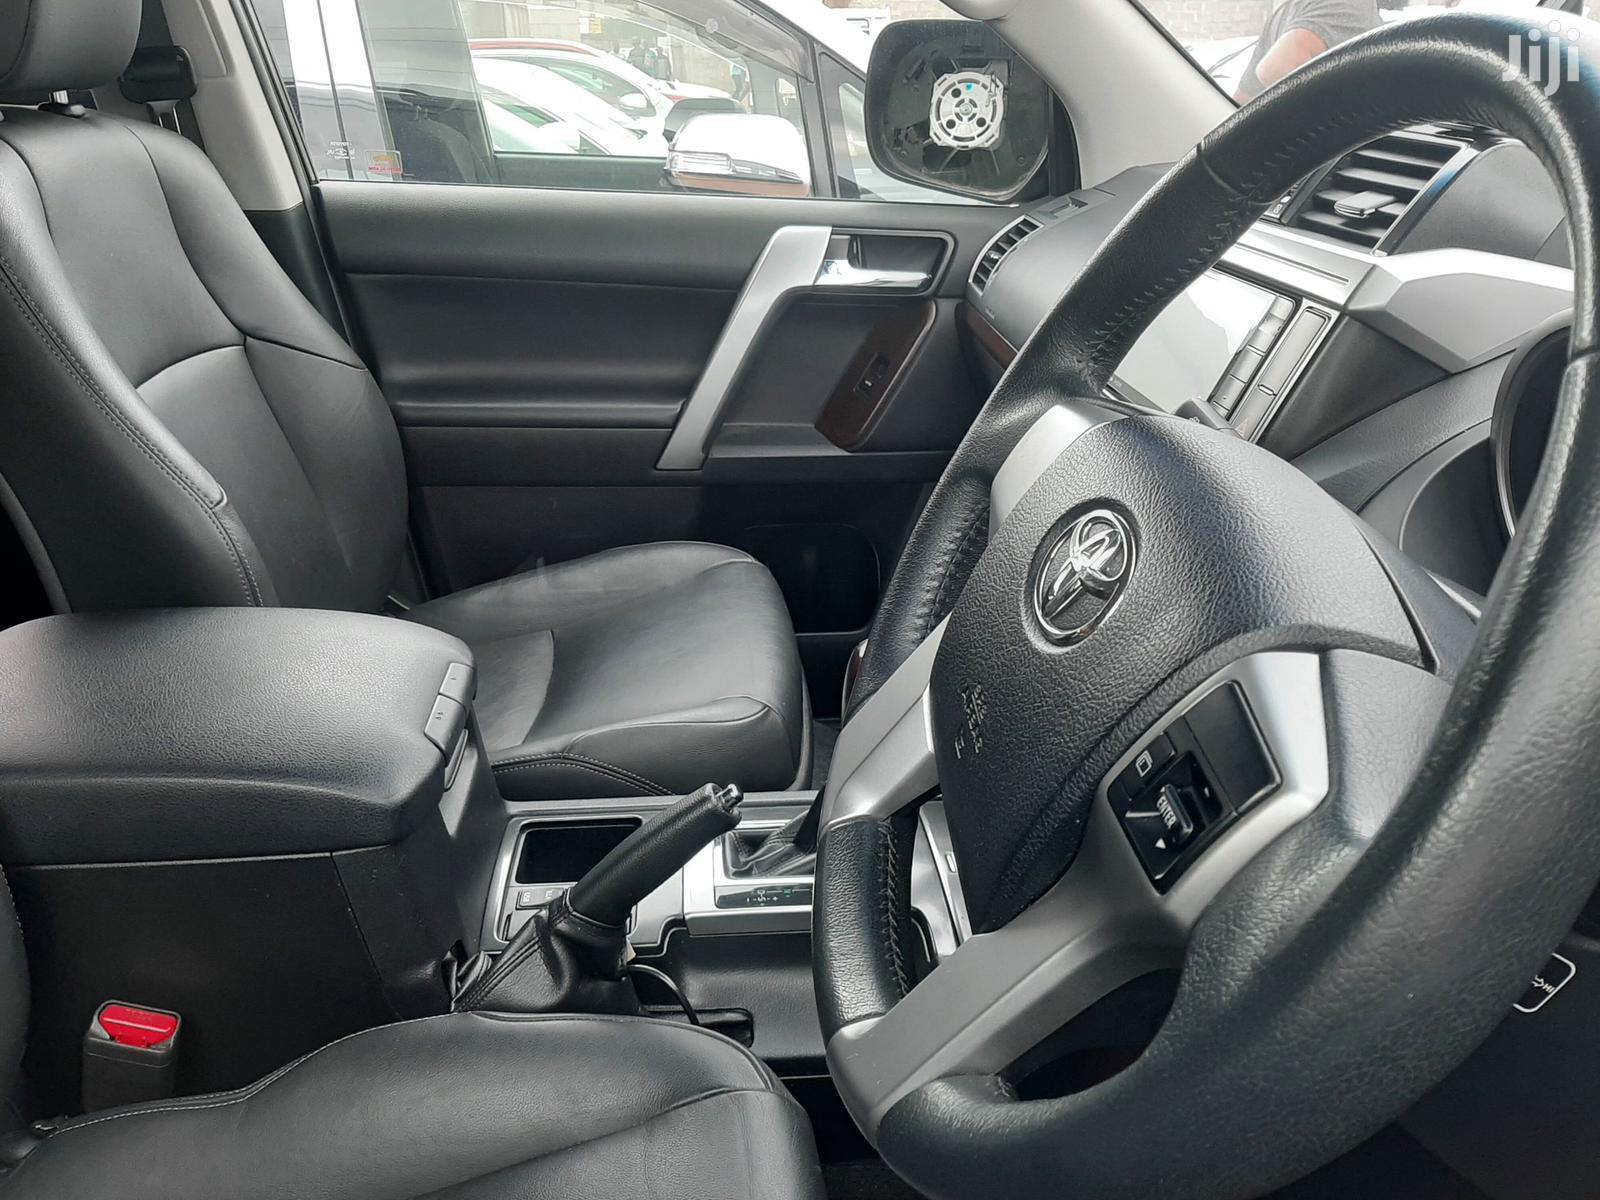 Toyota Land Cruiser Prado 2015 Black | Cars for sale in Kampala, Central Region, Uganda